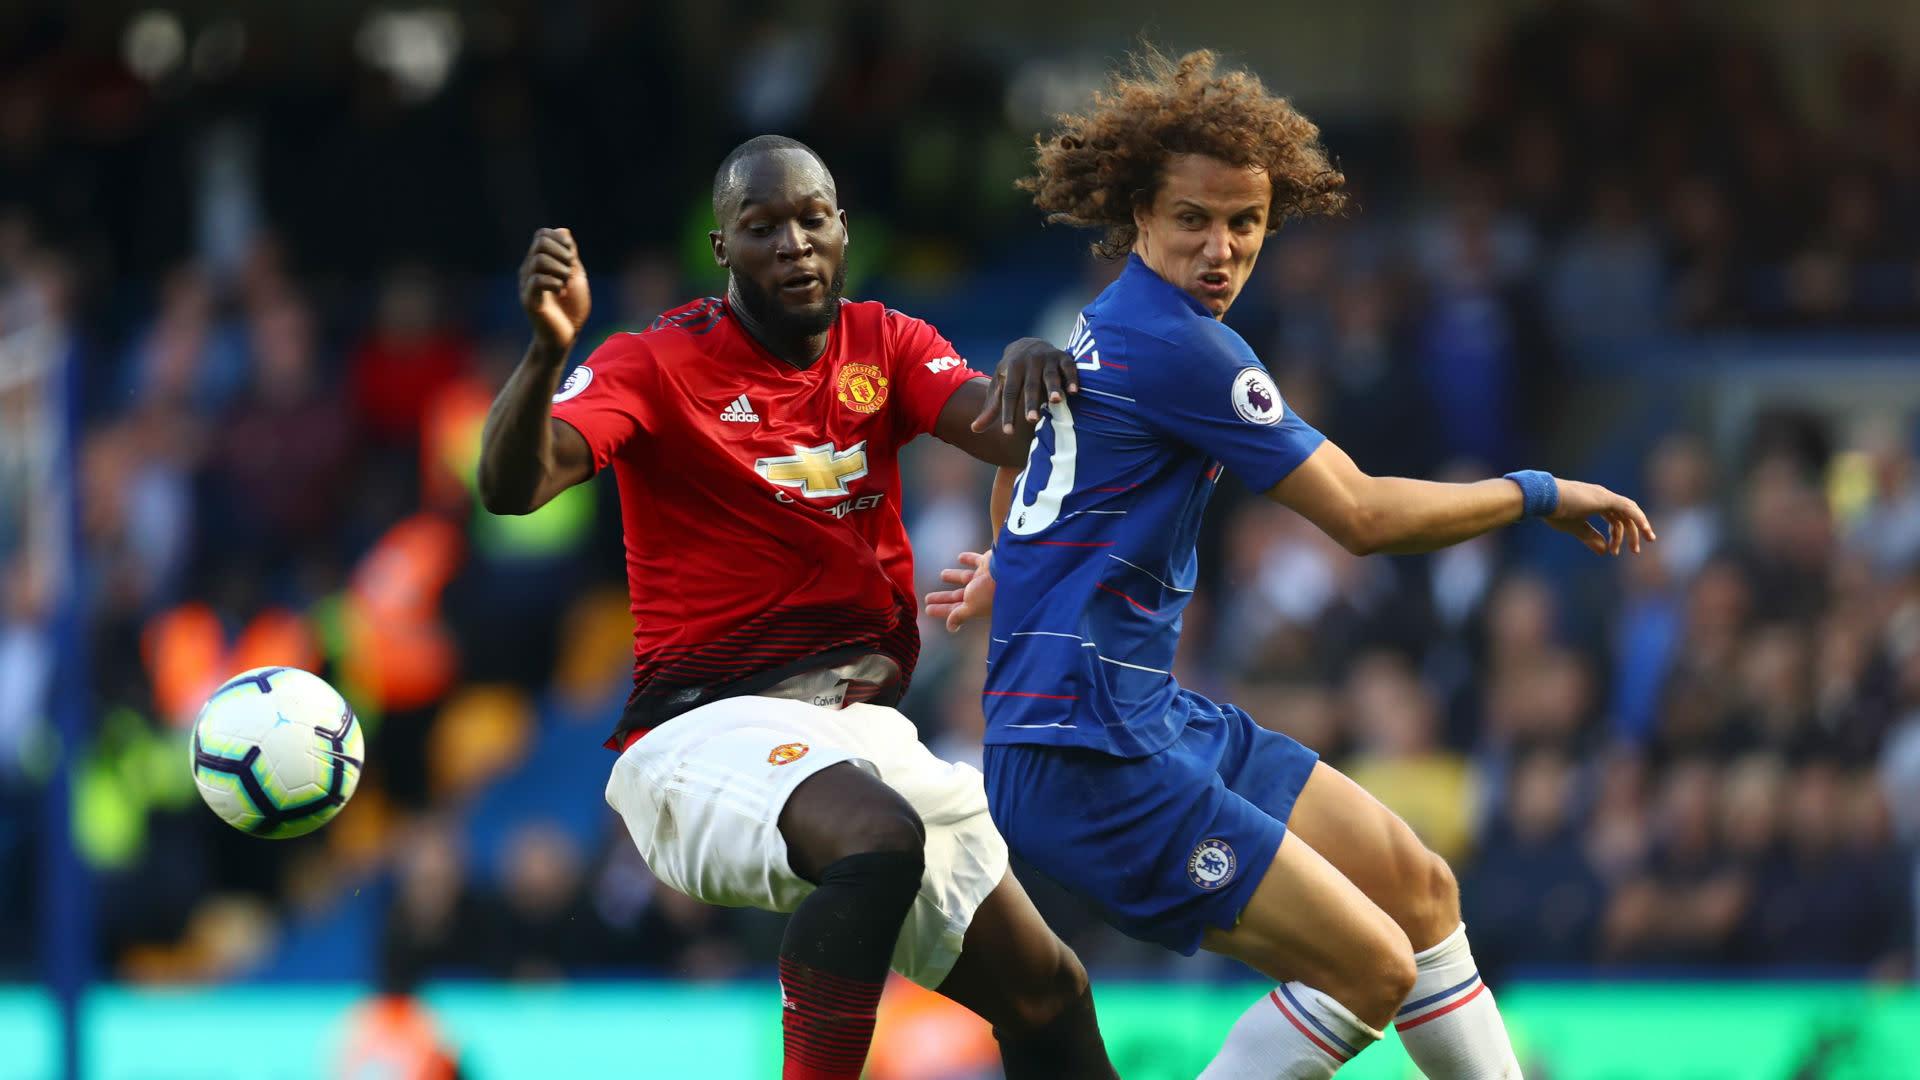 Deadline Day: Lukaku and David Luiz close in on Inter and